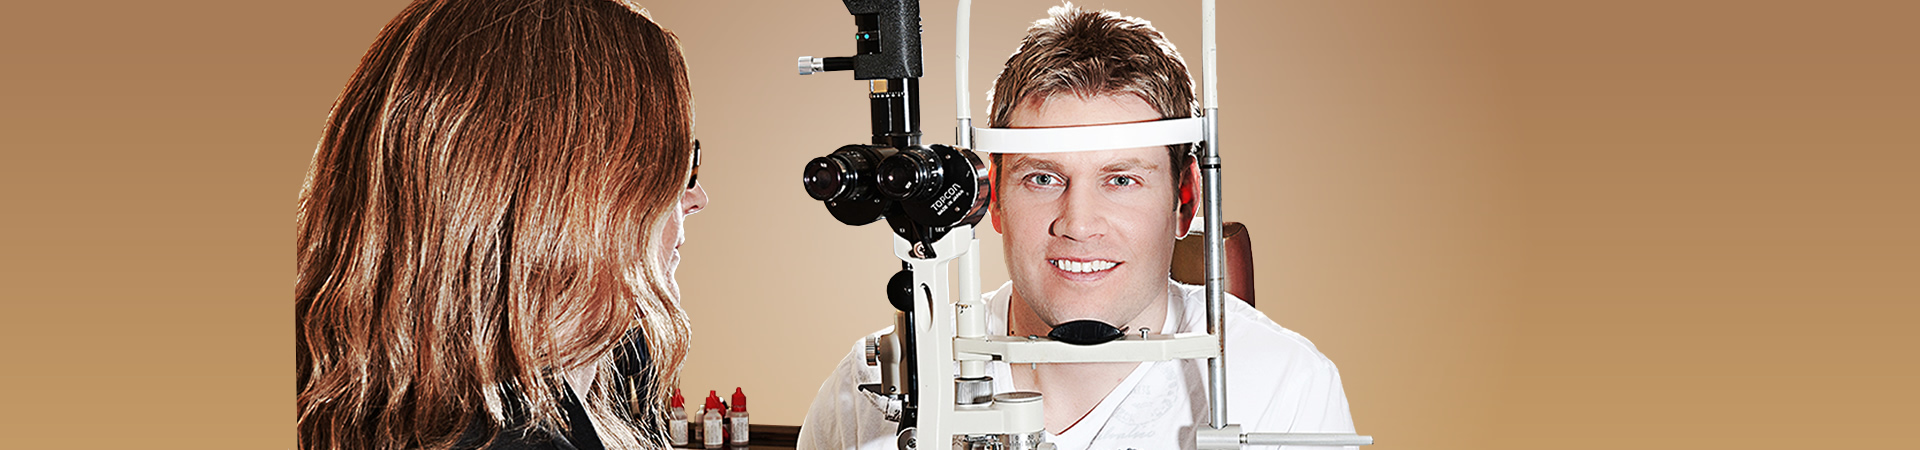 Eye Exams Valleytown Eye Care